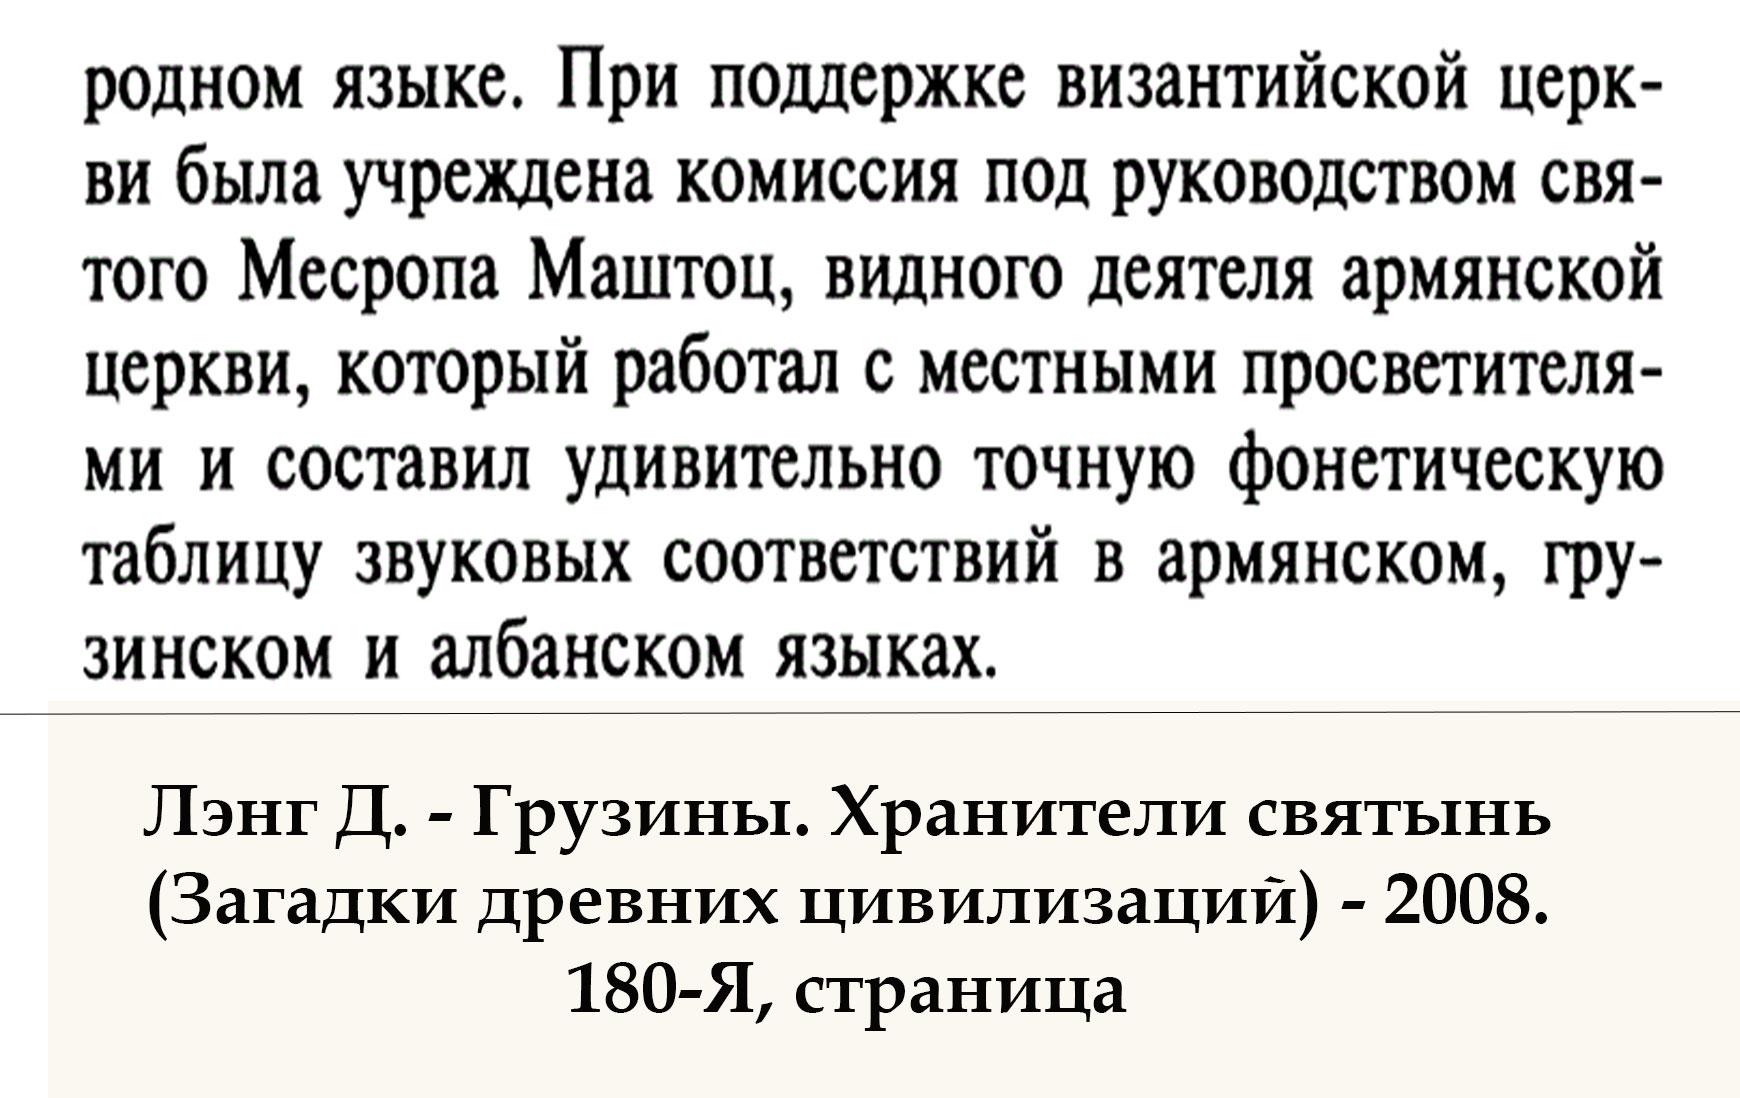 Ljeng-D_---Gruziny_-Hraniteli-svjatyn_-_Zagadki-drevnih-civilizacij_---2008_-180-stranica.jpg